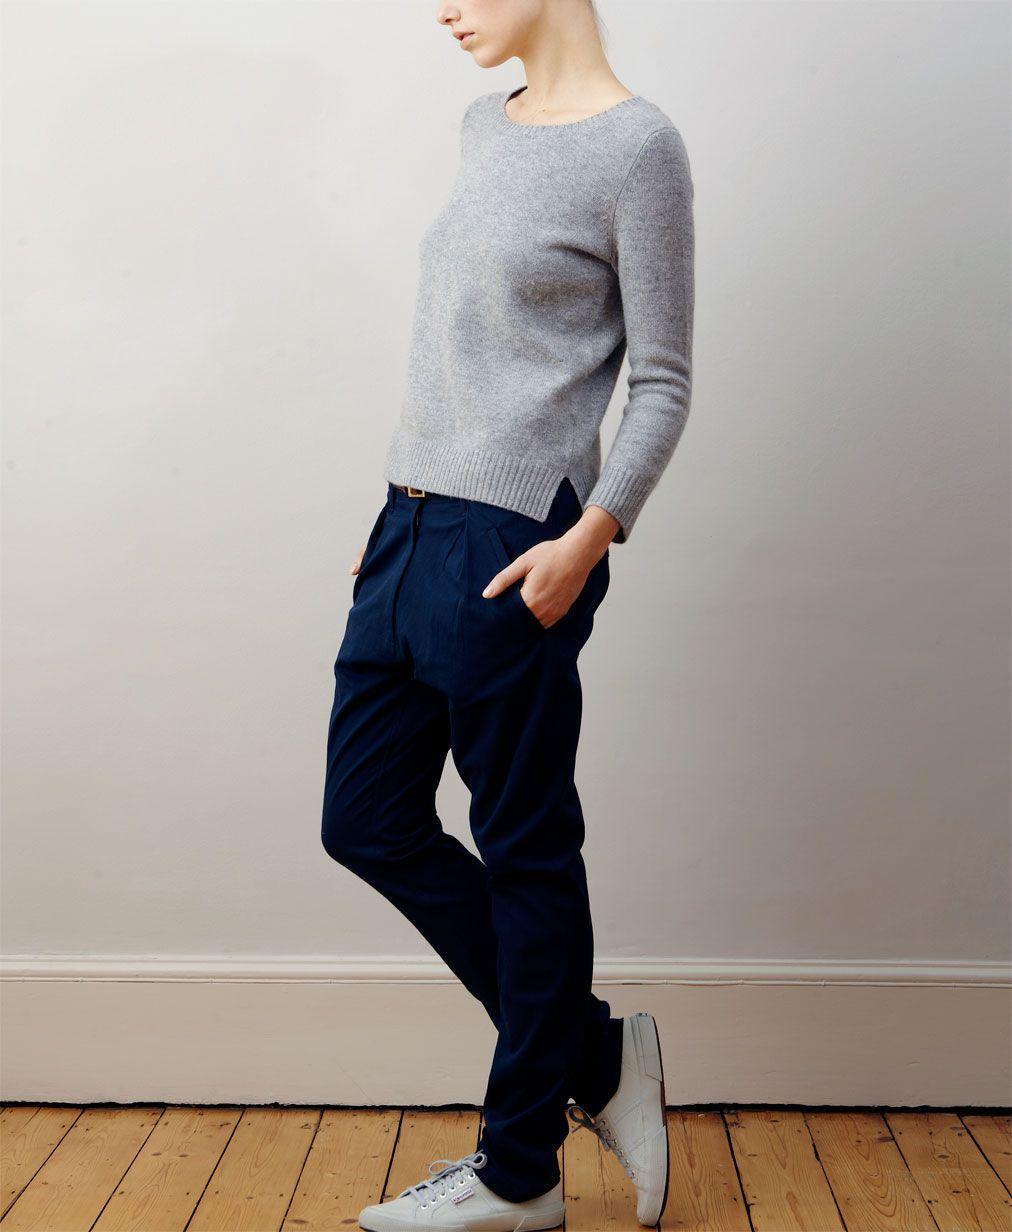 Lana Knit + Firenze Pant